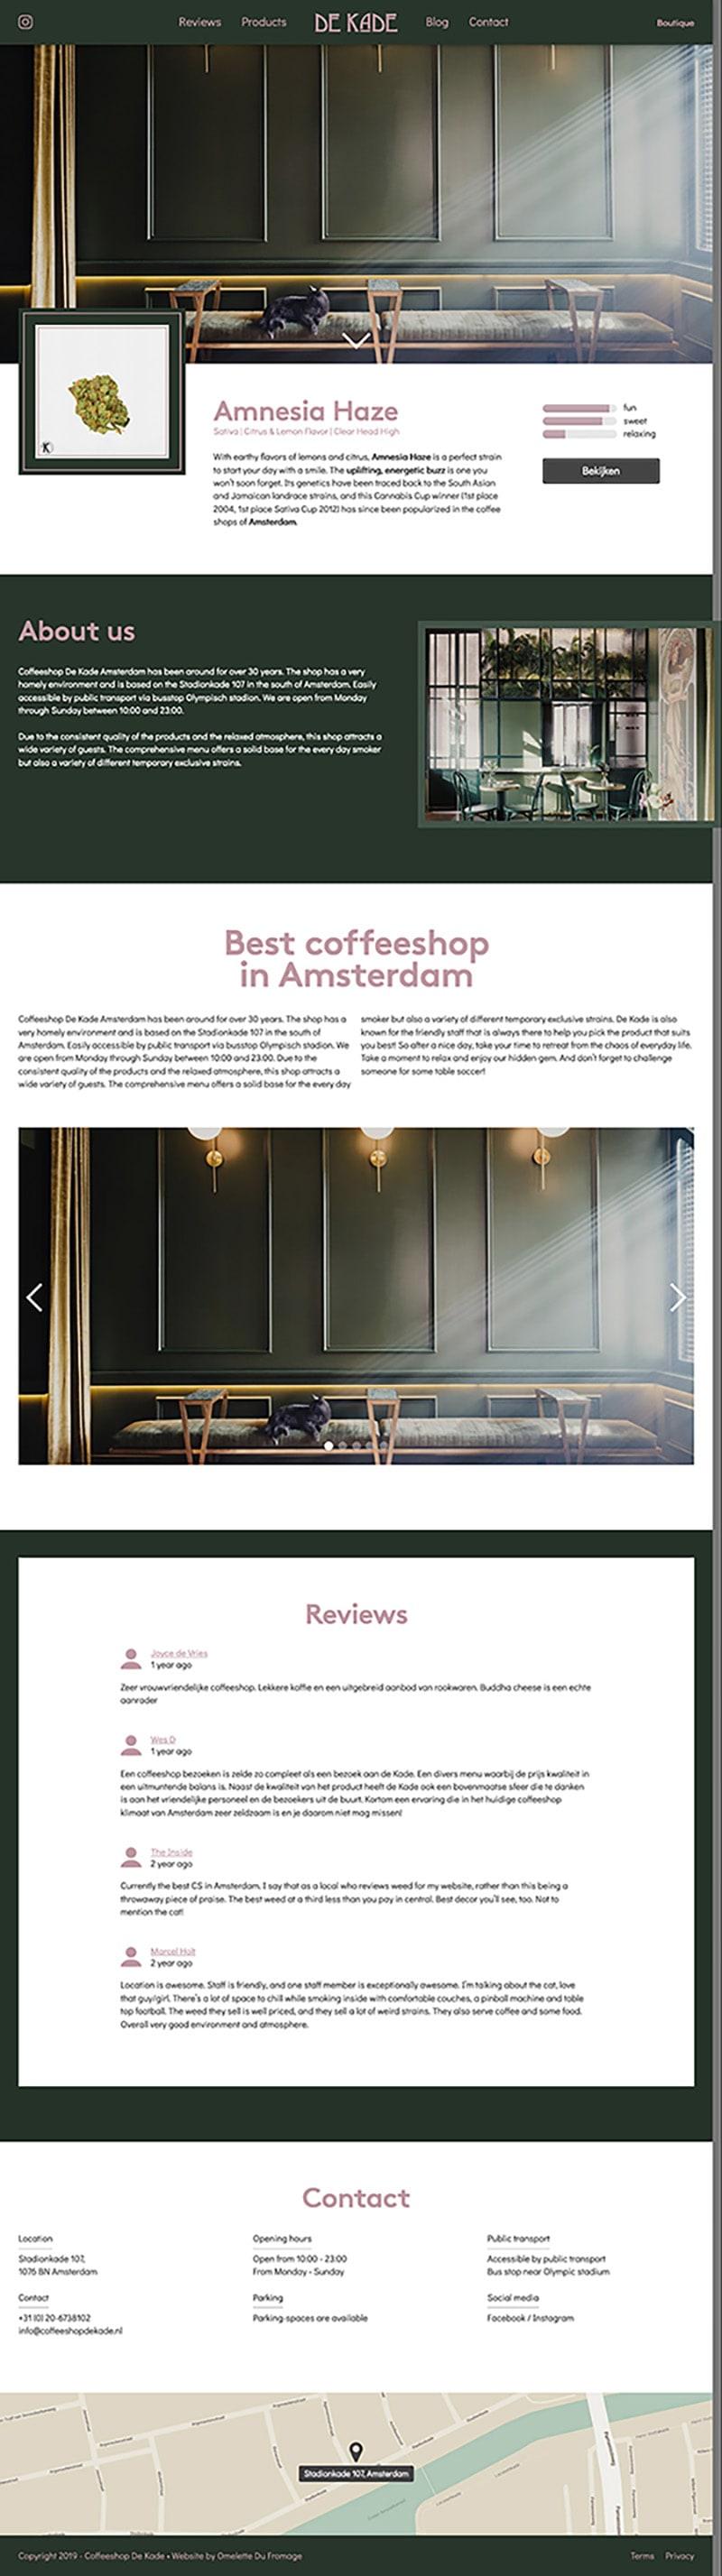 A screenshot of the coffeeshopdekade.nl website.